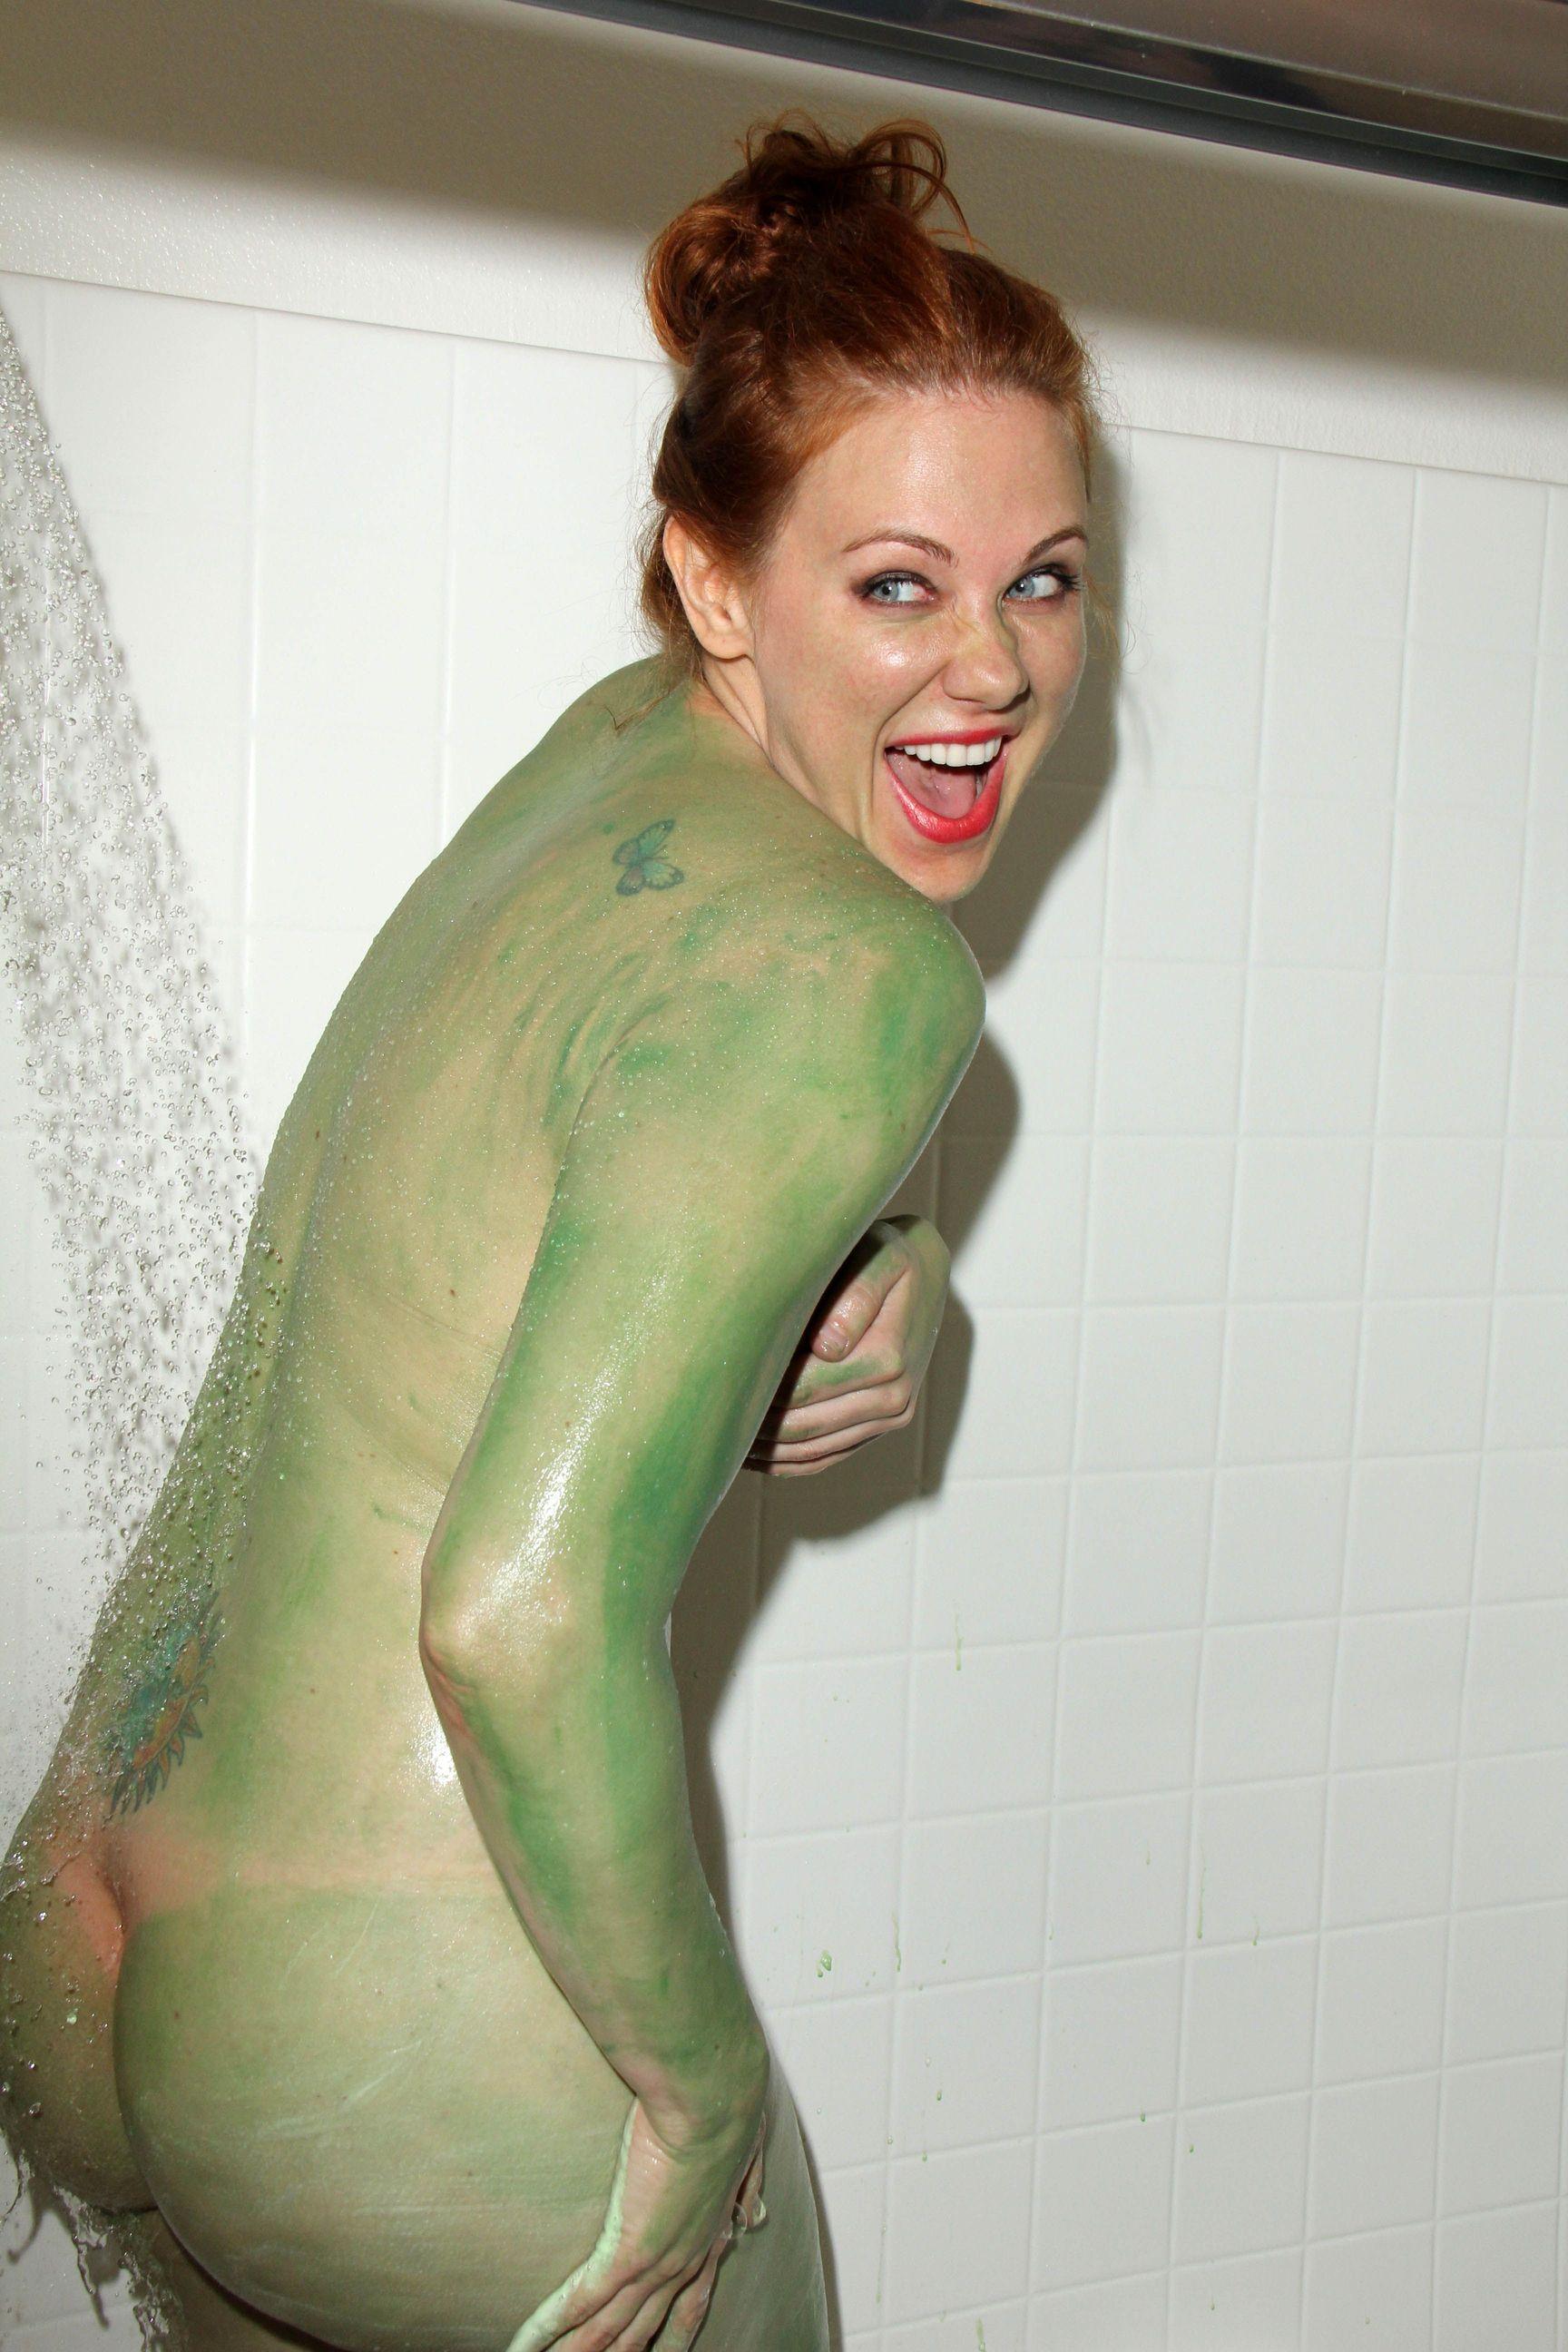 Maitland Ward Topless Pho...